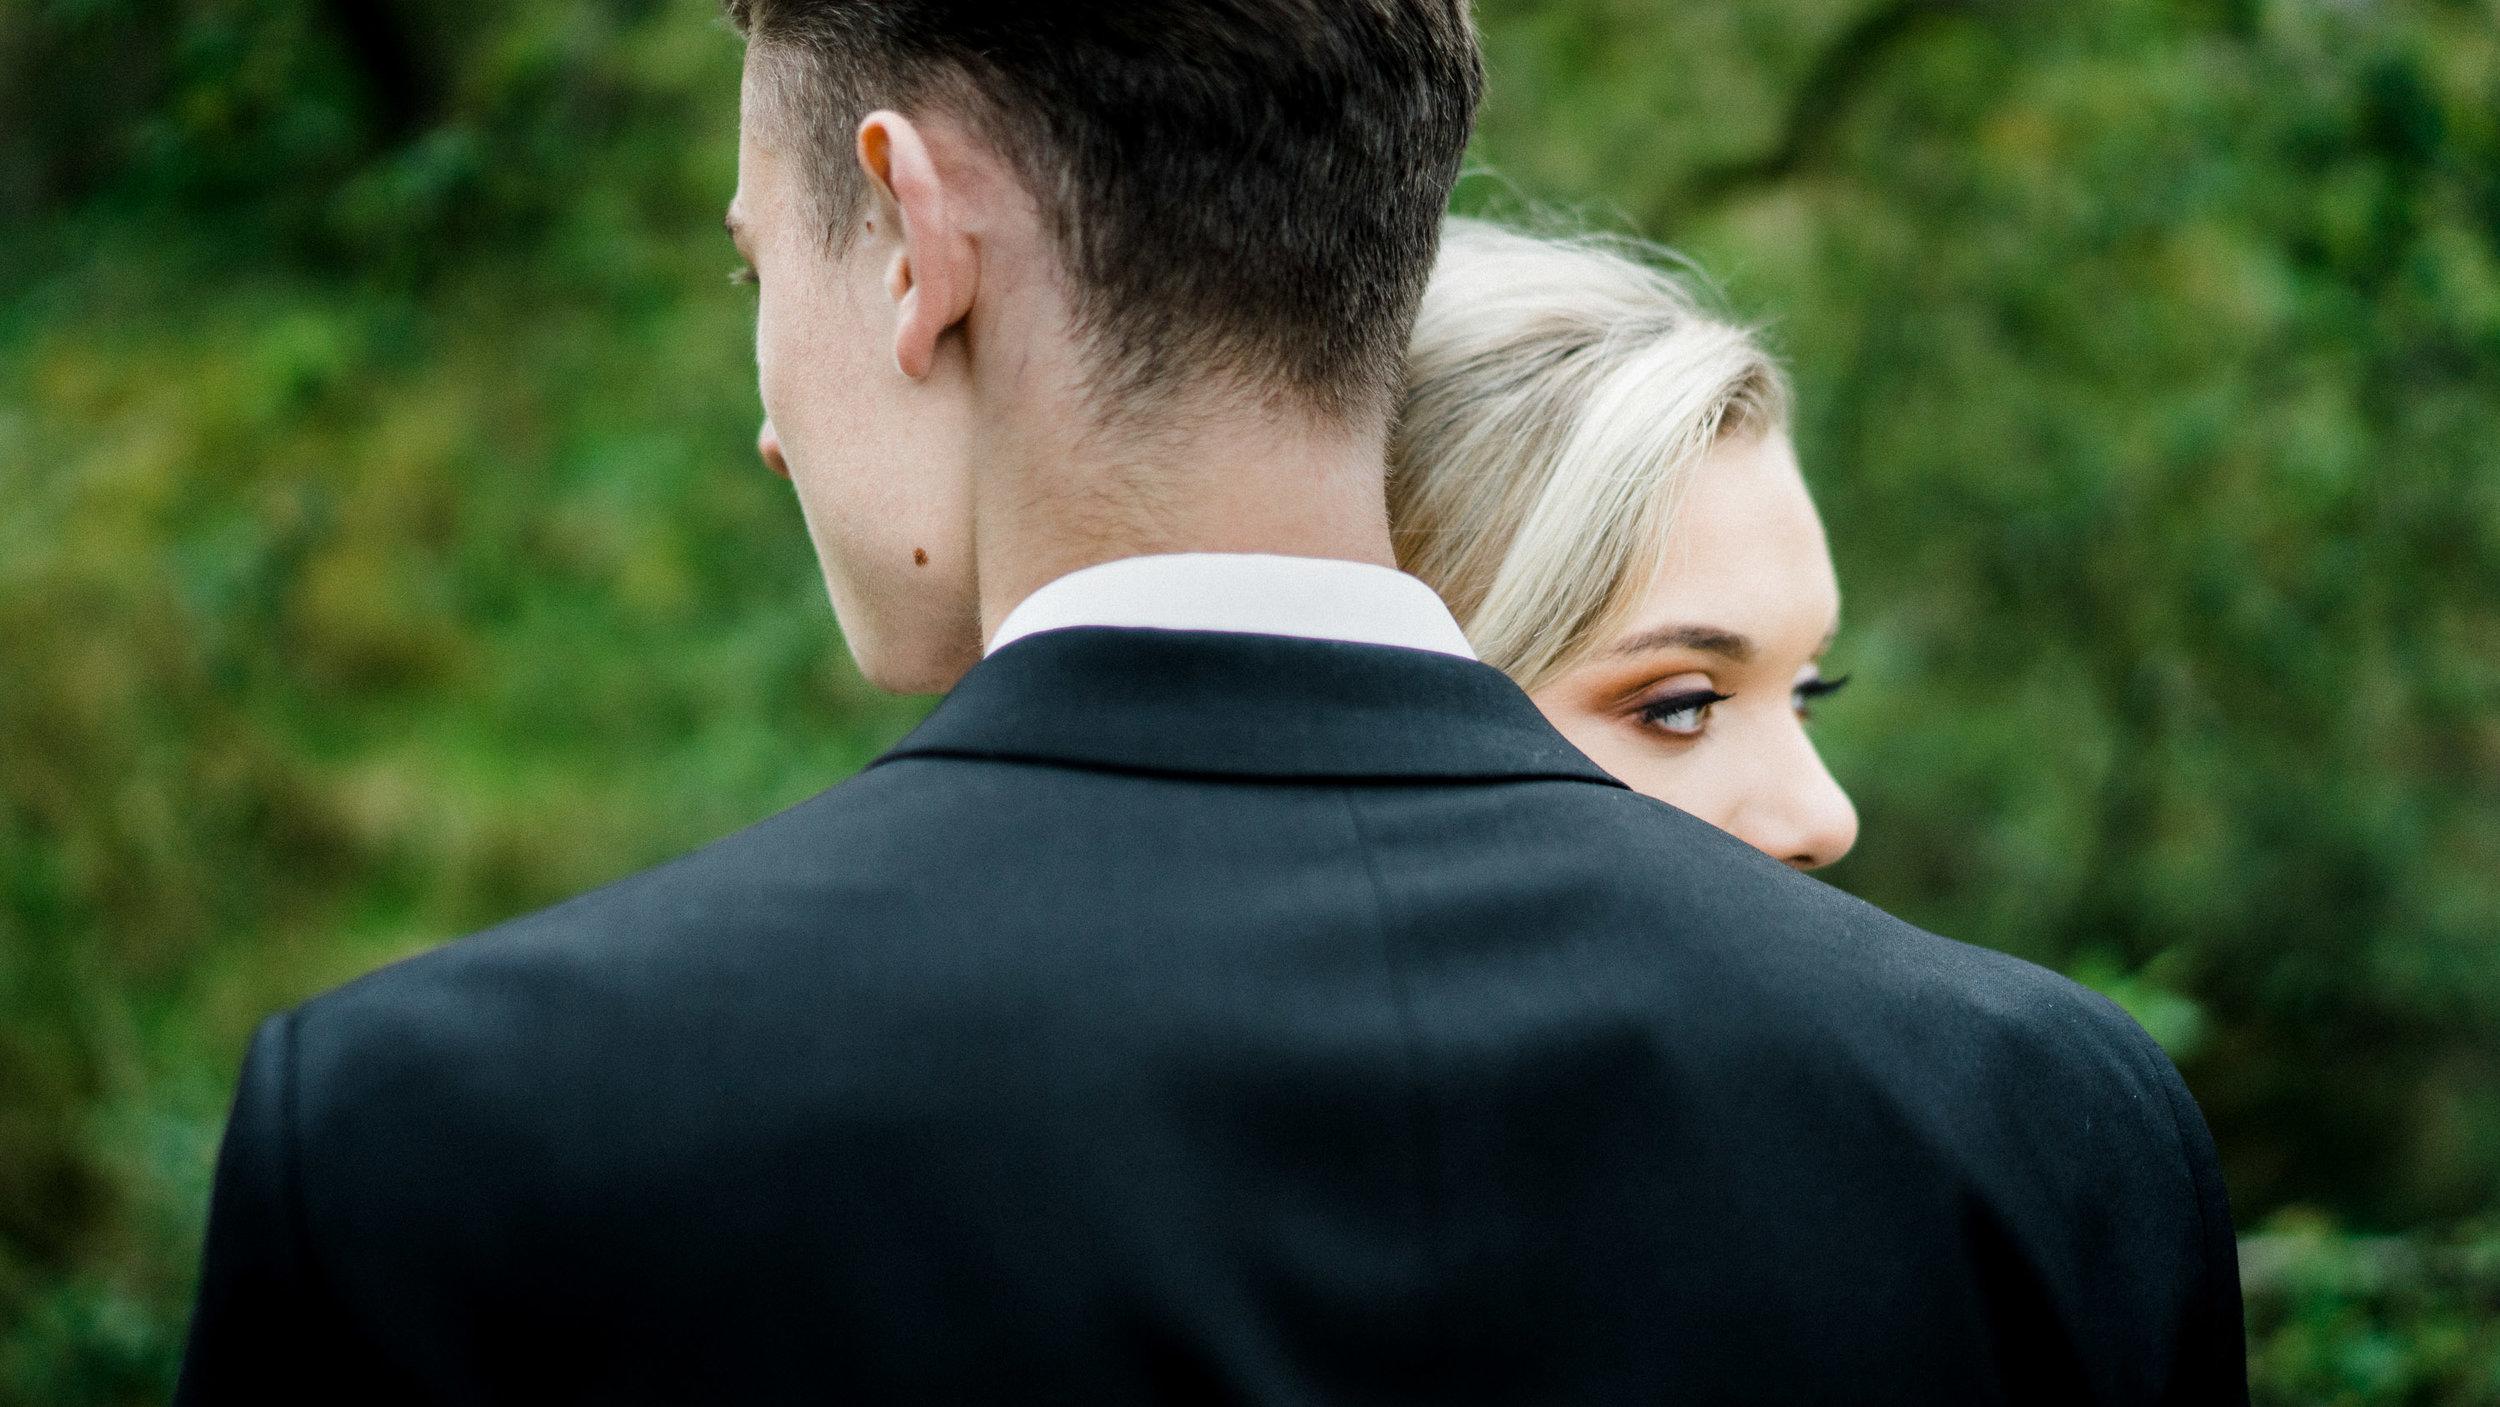 www.bytomw.com - Tom Wright - Manchester & Lake District Wedding Photographer -01054.jpg